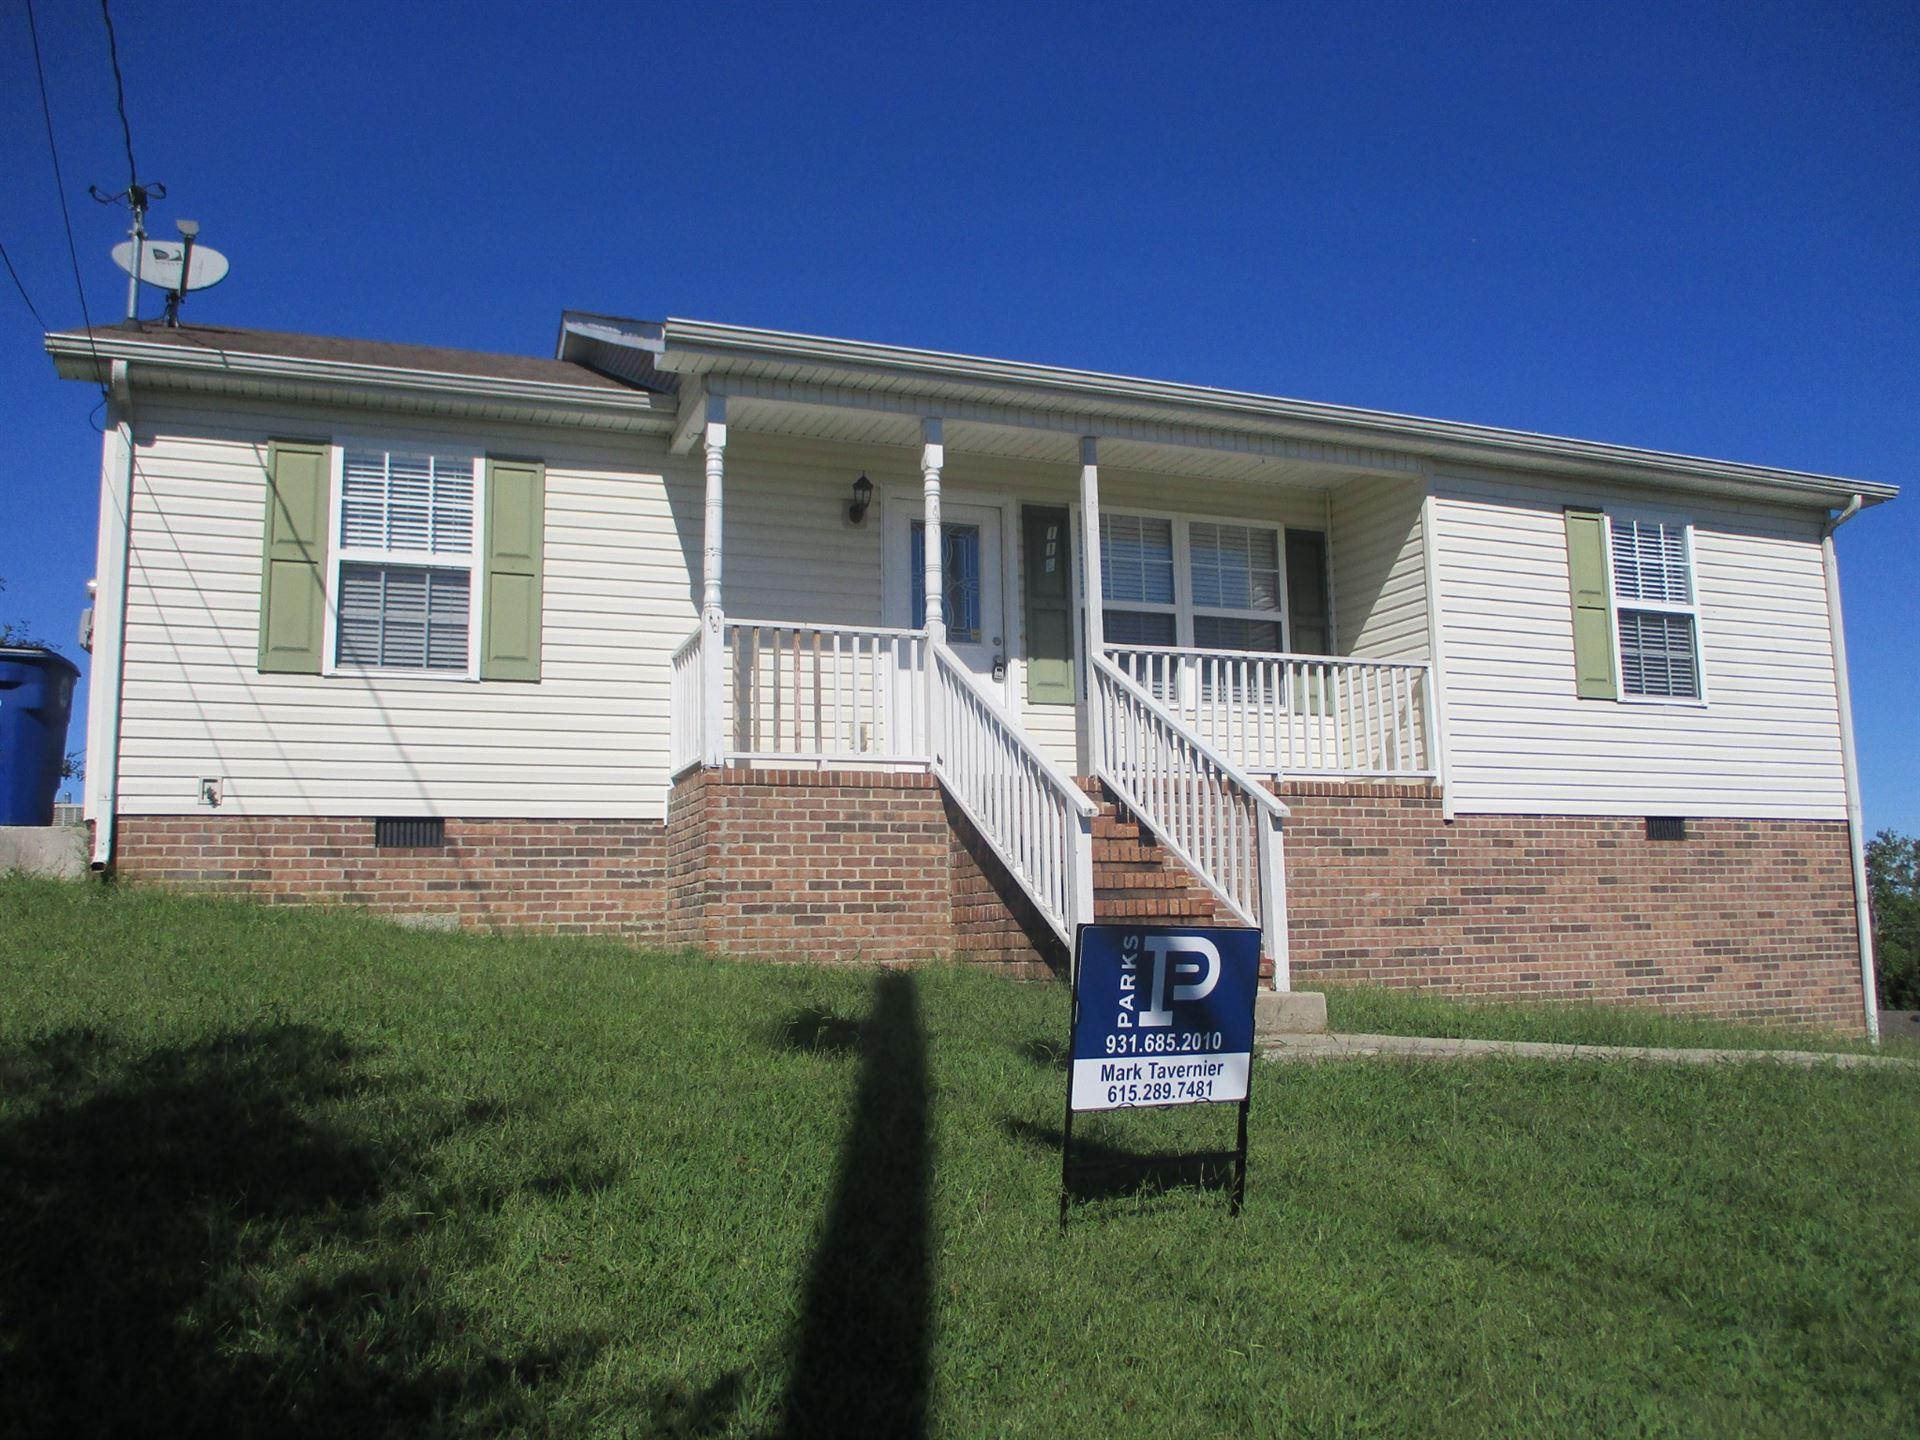 116 Sunrise Ct, Shelbyville, TN 37160 - MLS#: 2293052